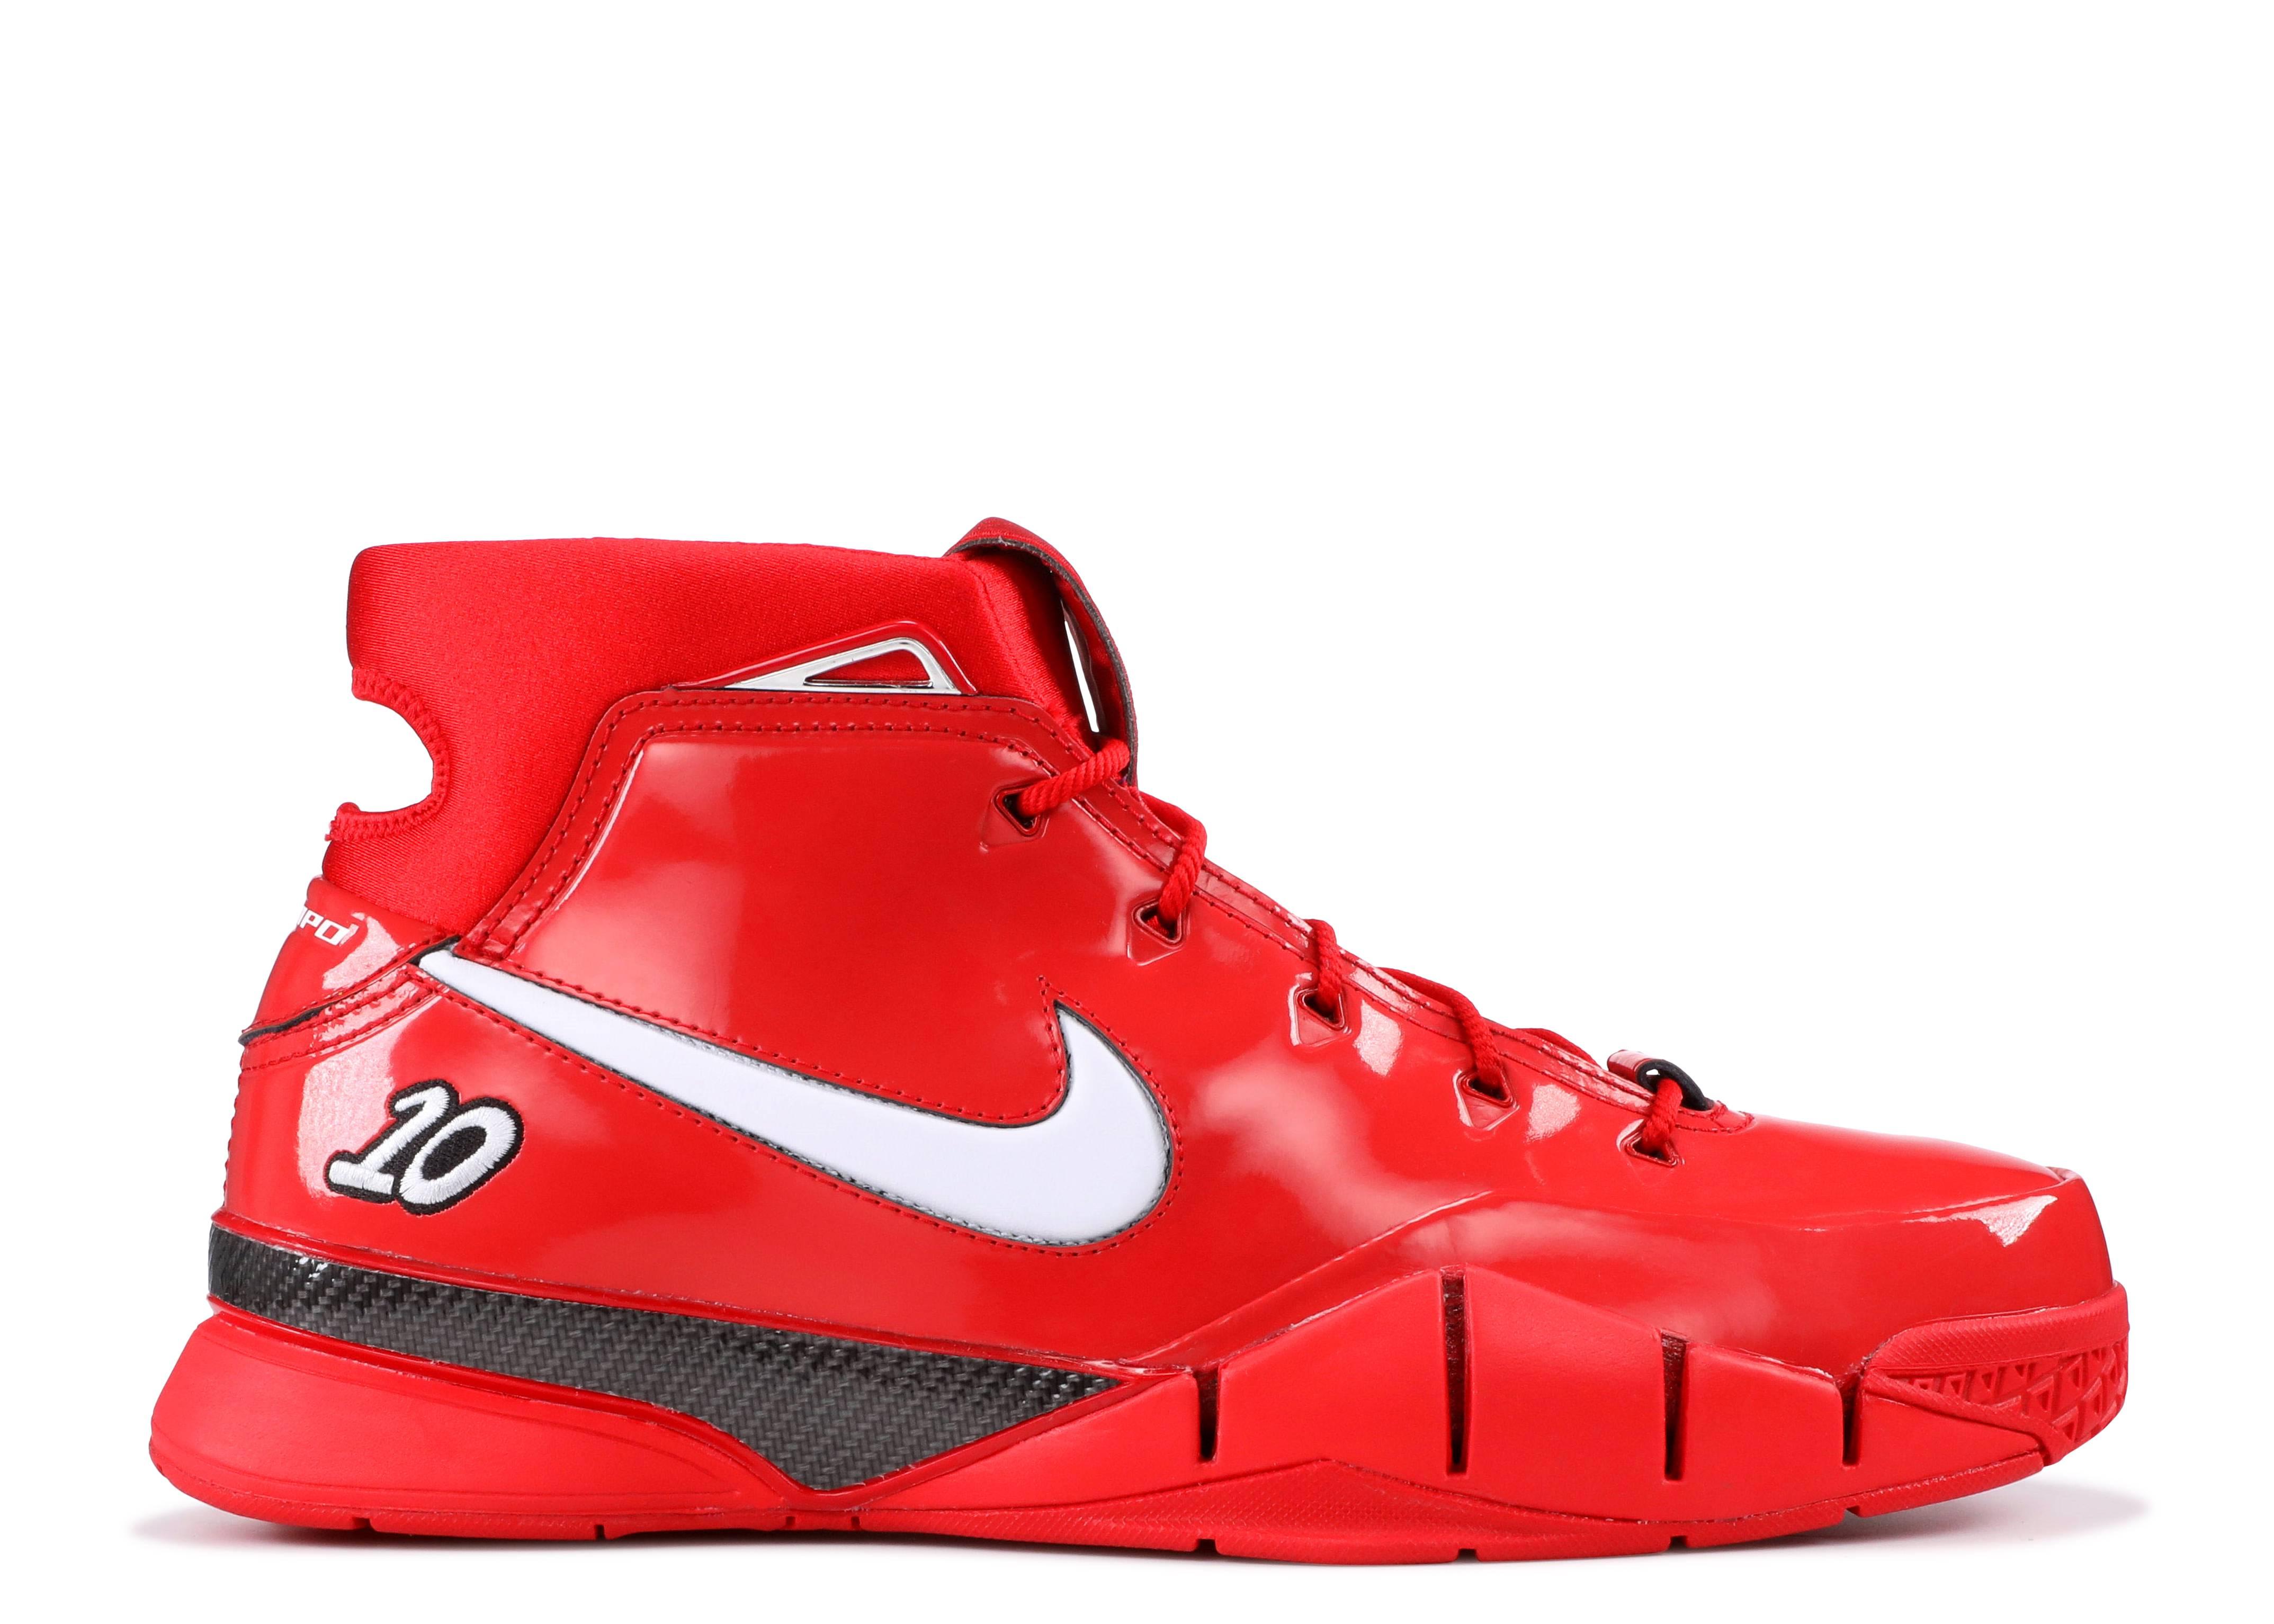 645bd63d3ae Kobe Bryant - Nike Basketball - Nike